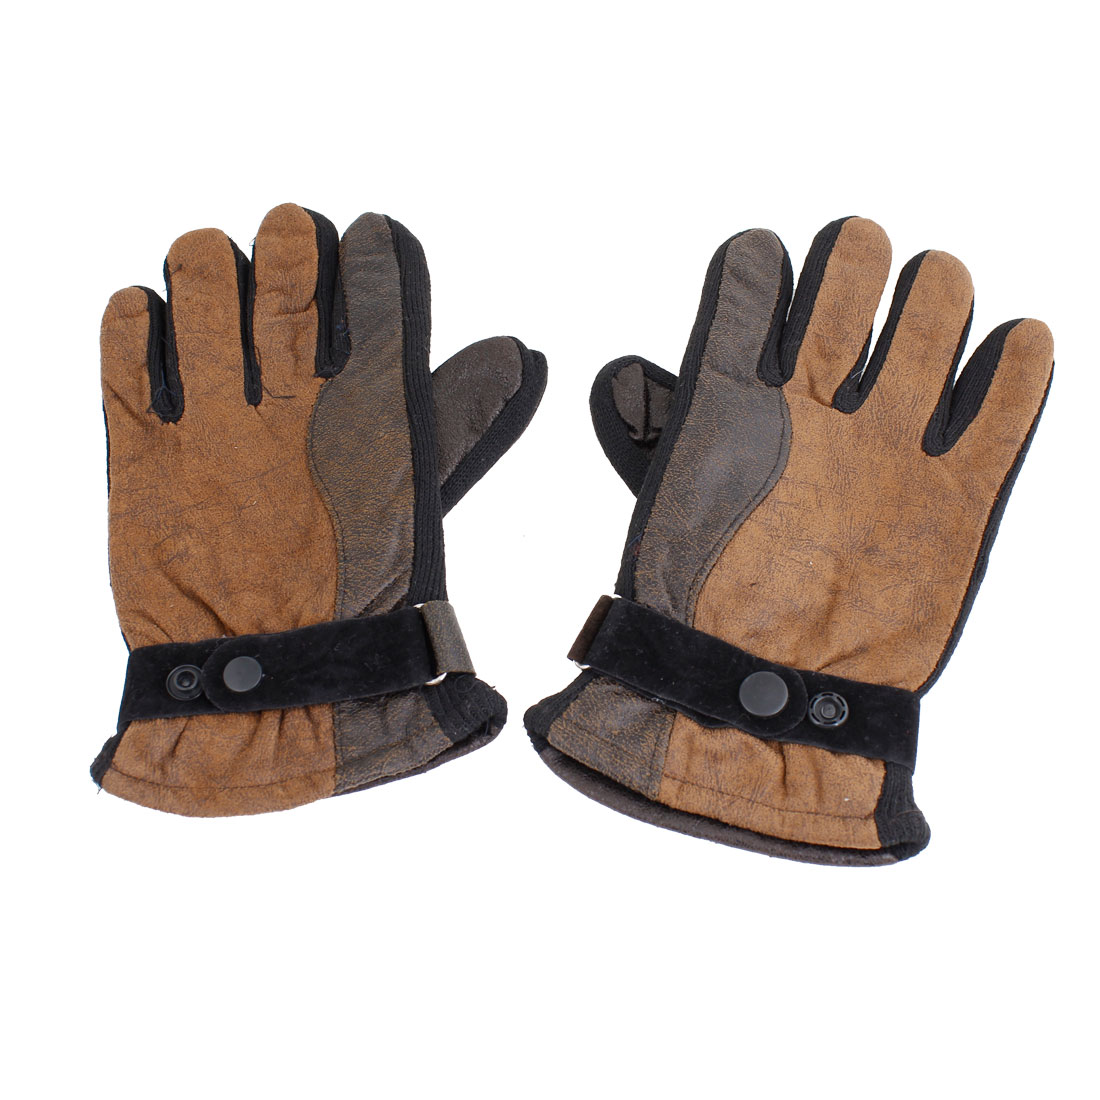 Ladies Dark Brown Outdoor Fleece Lining Warm Full Finger Gloves Pair